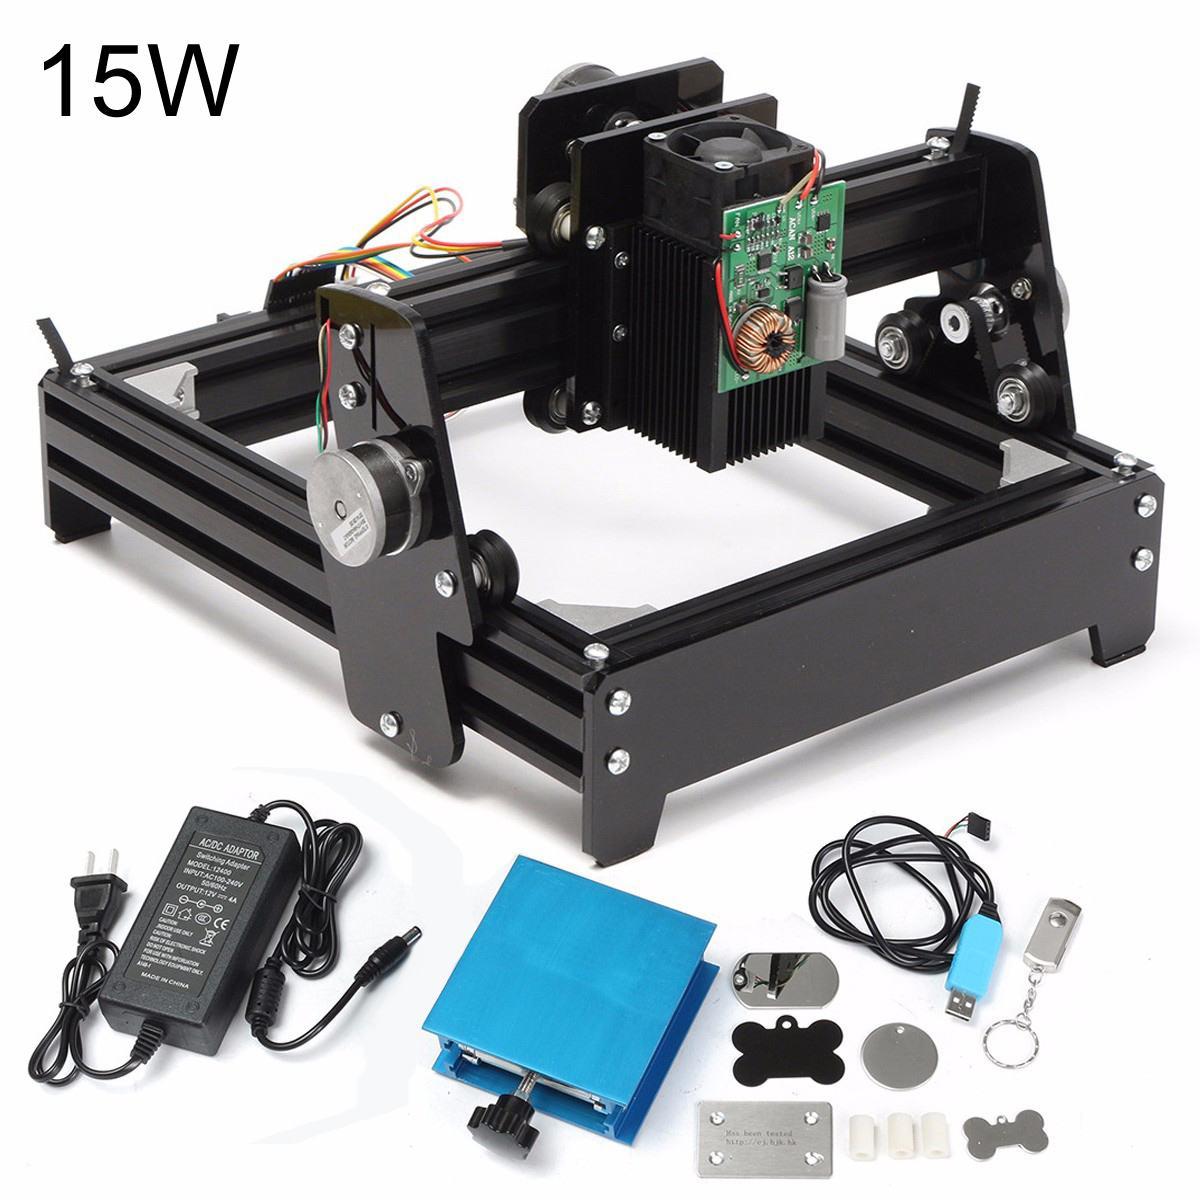 15W Laser AS 5 USB Desktop 15000mW CNC Laser Engraver DIY Marking Machine Router For Metal Stone Wood Engraving Area 14 x 20cm